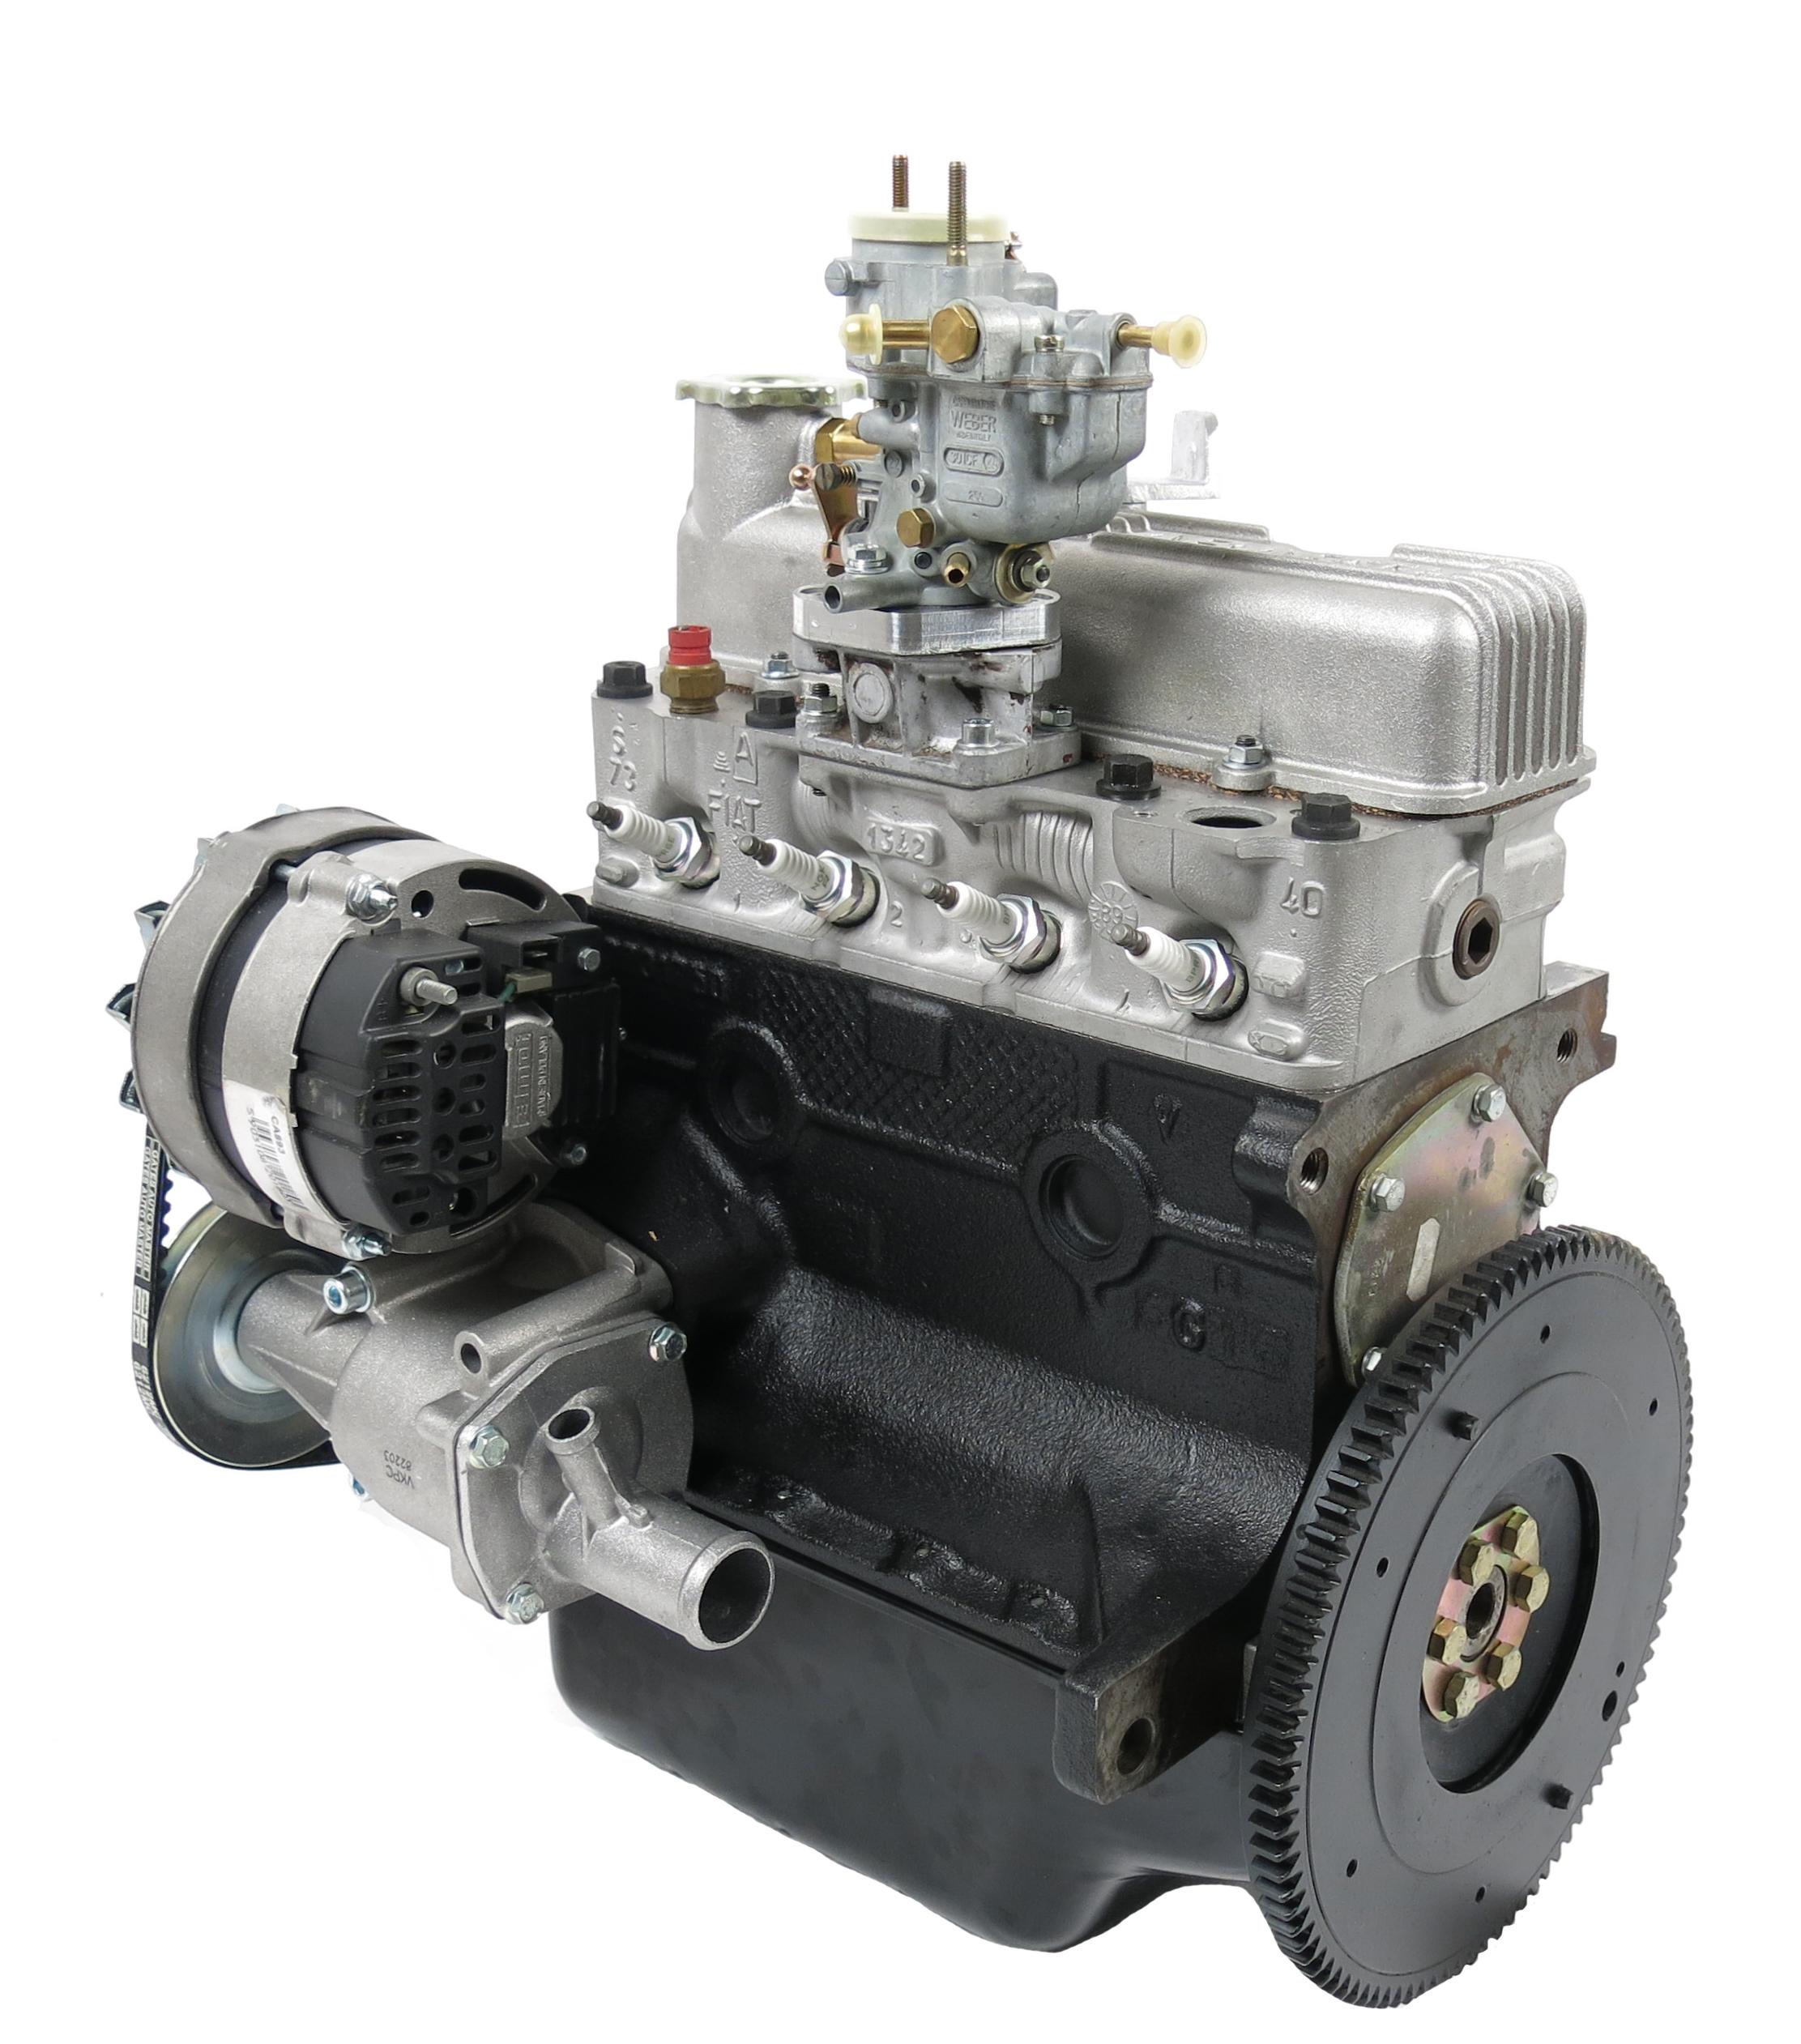 Fiat 600 D 70 HP Sport Engine 770 Cc Rebuilt